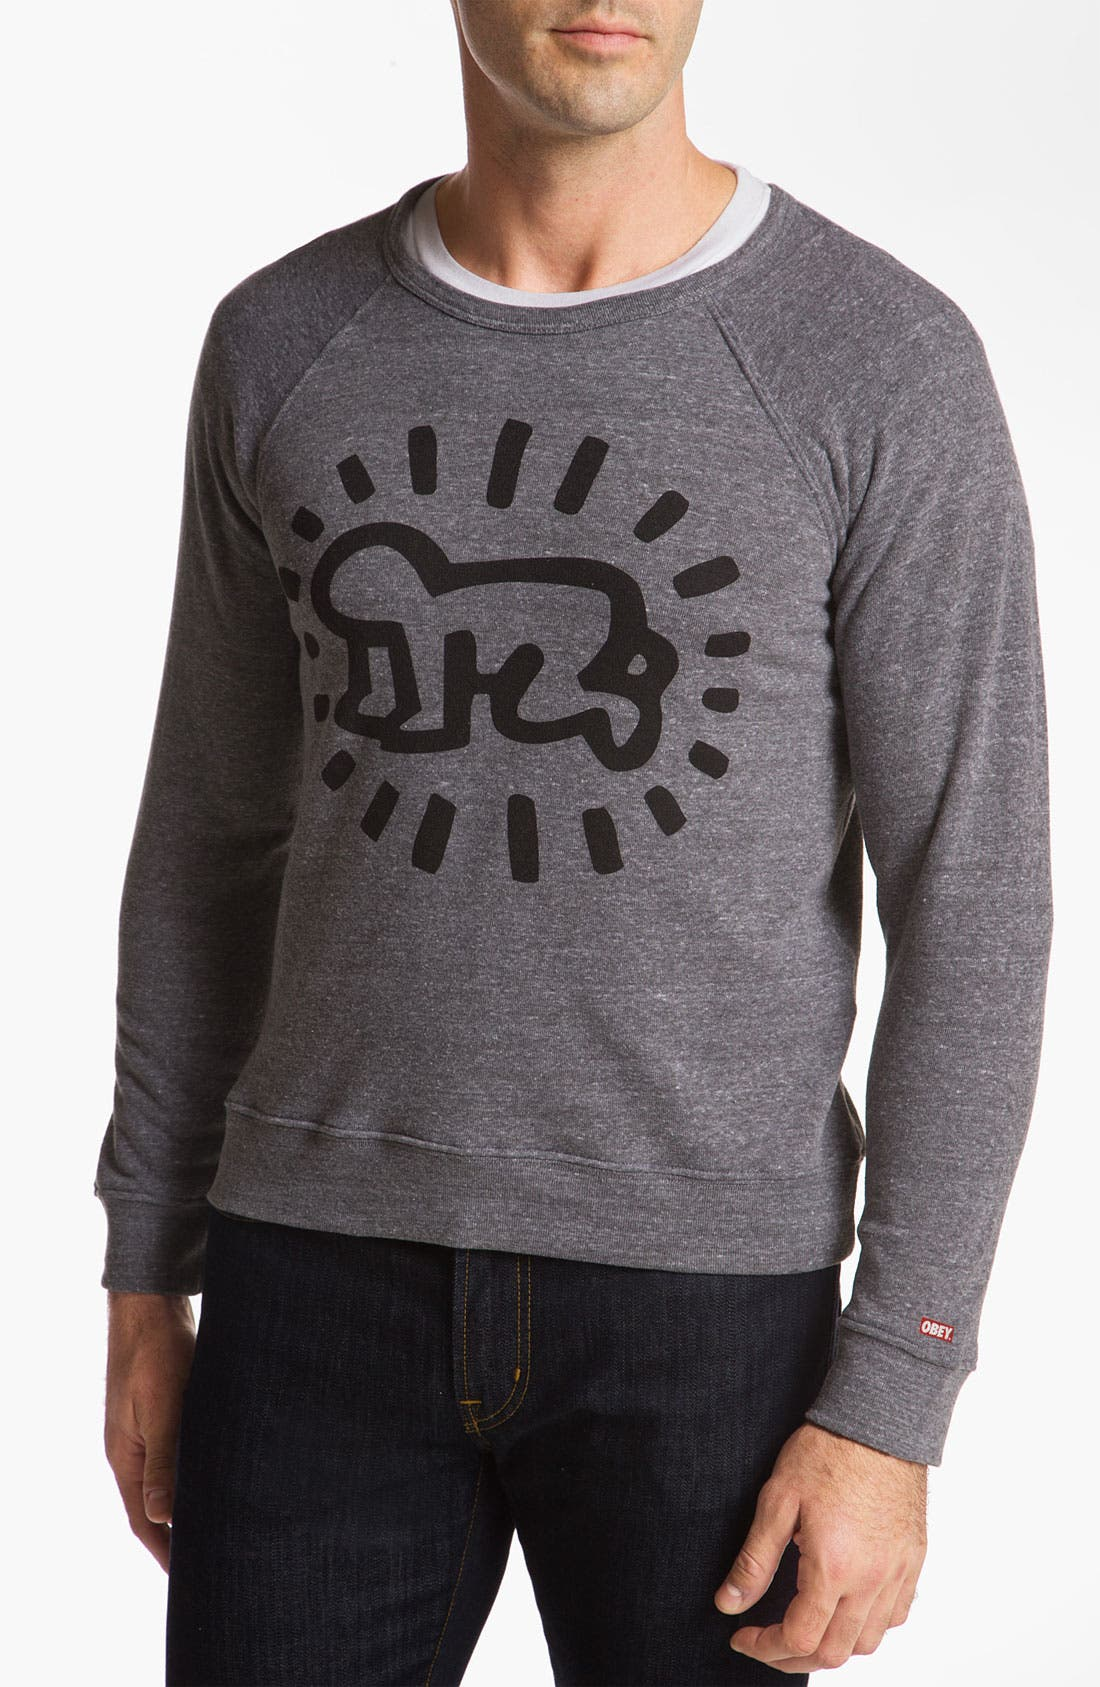 Alternate Image 1 Selected - Obey 'Keith Haring Baby' Crewneck Sweatshirt